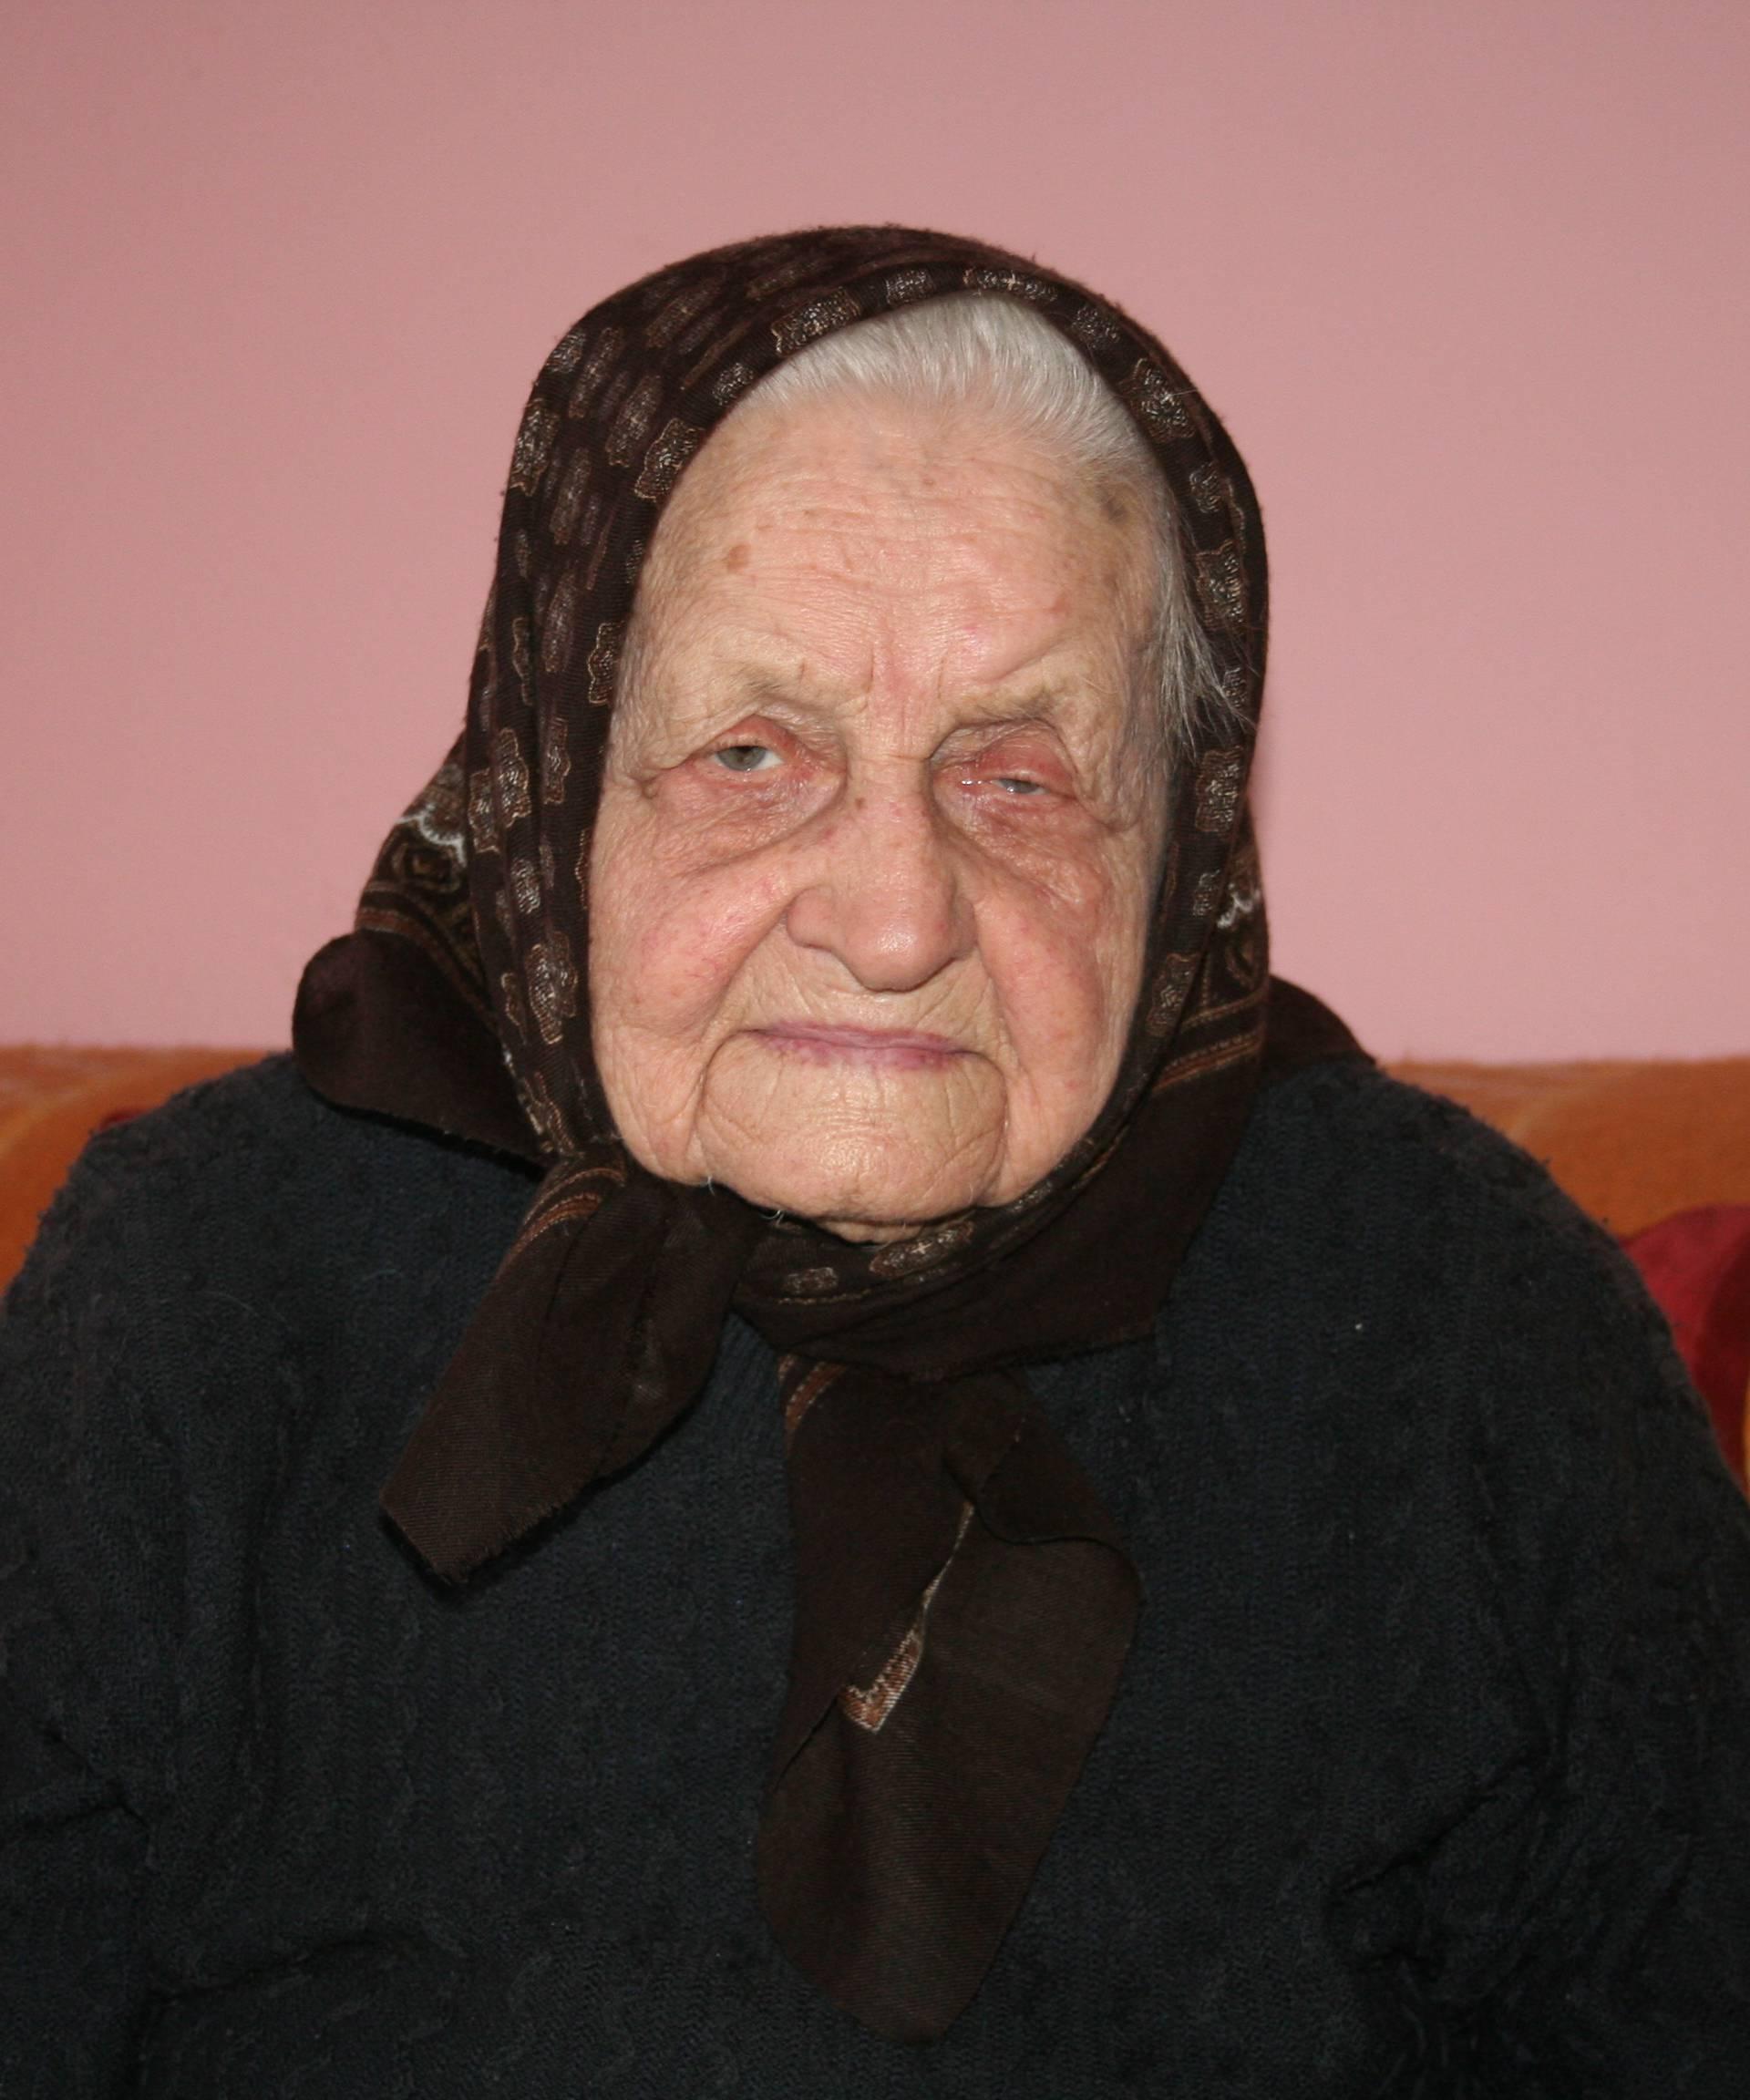 Baka Ana (91): Rado zapjevam stihove iz 1936. godine i danas